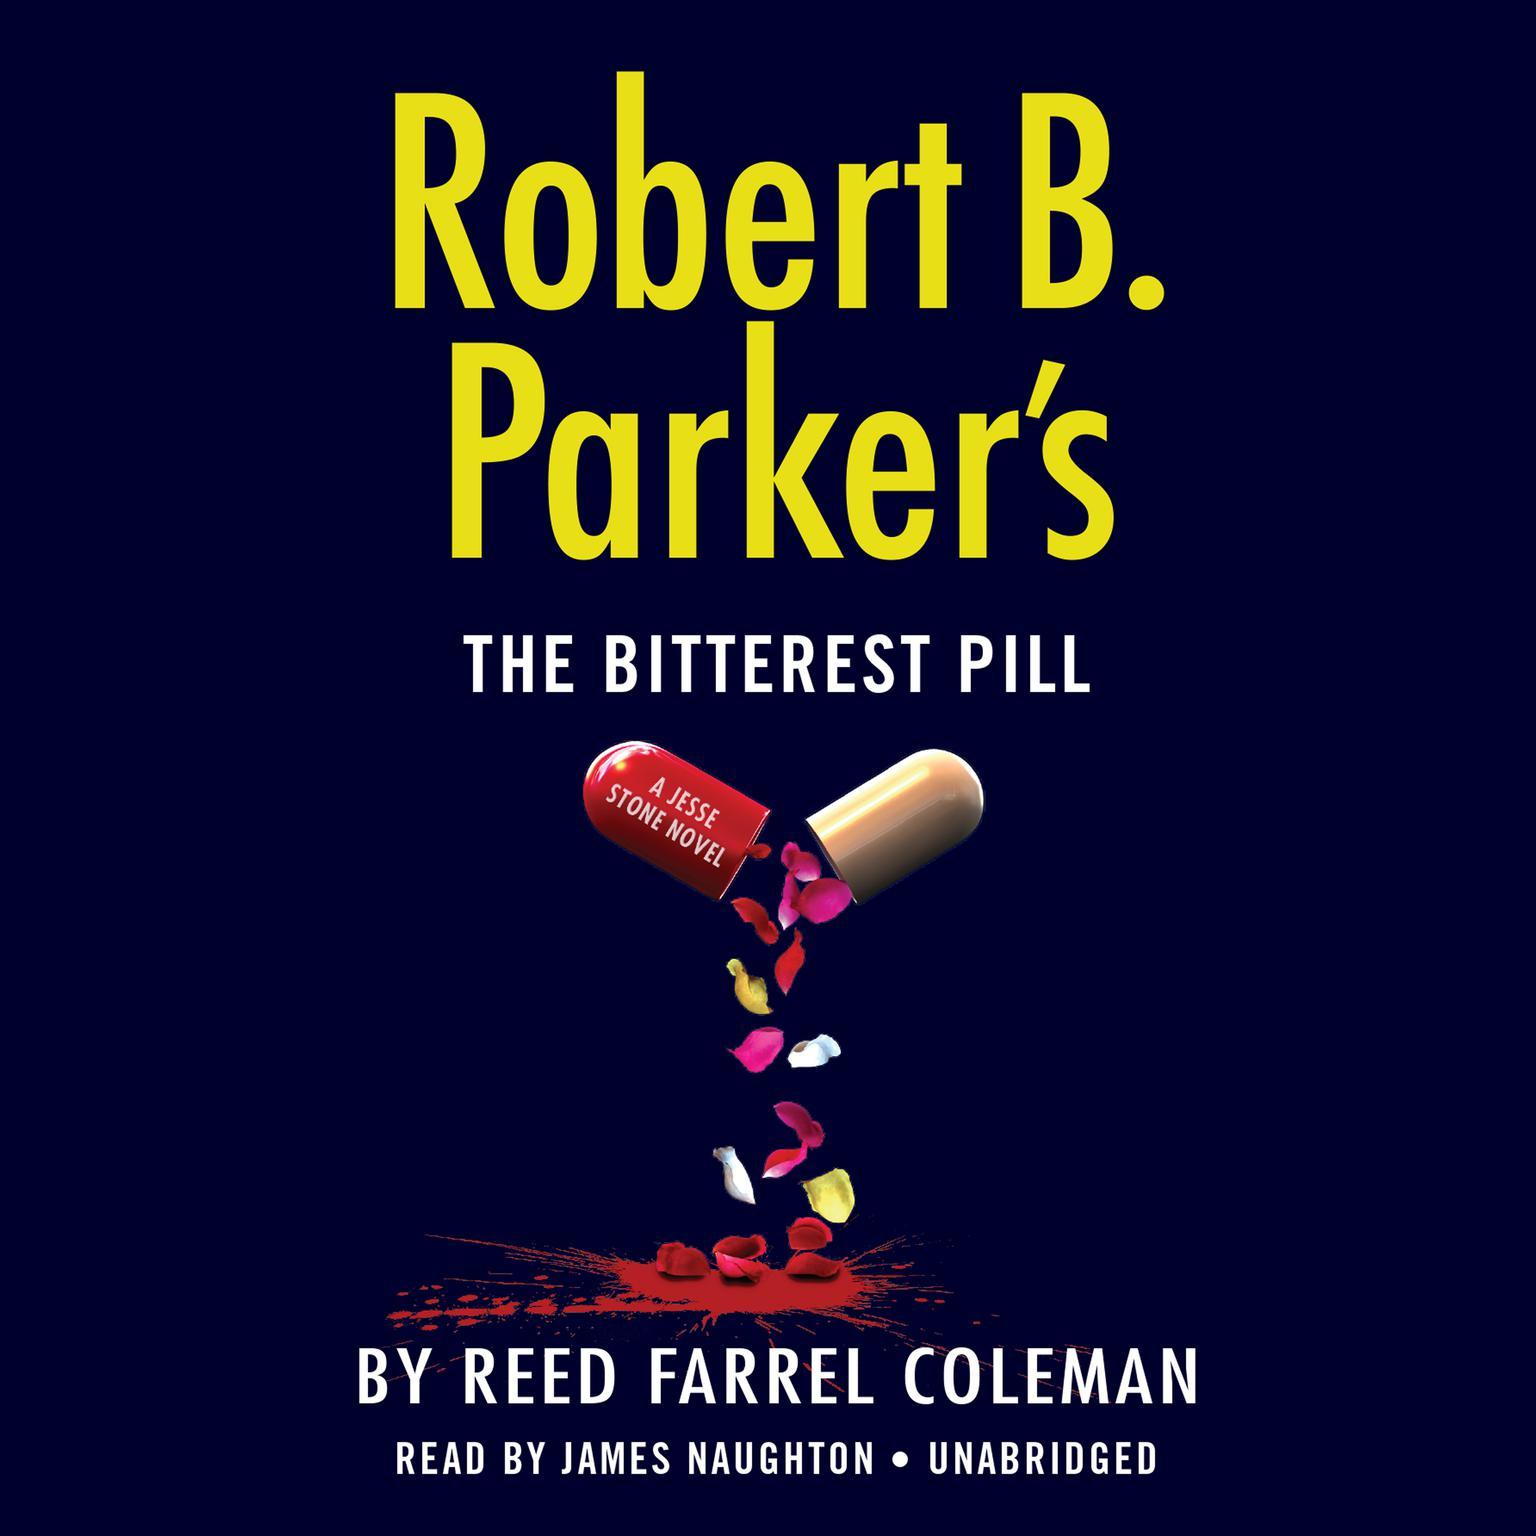 Robert B. Parkers The Bitterest Pill Audiobook, by Reed Farrel Coleman